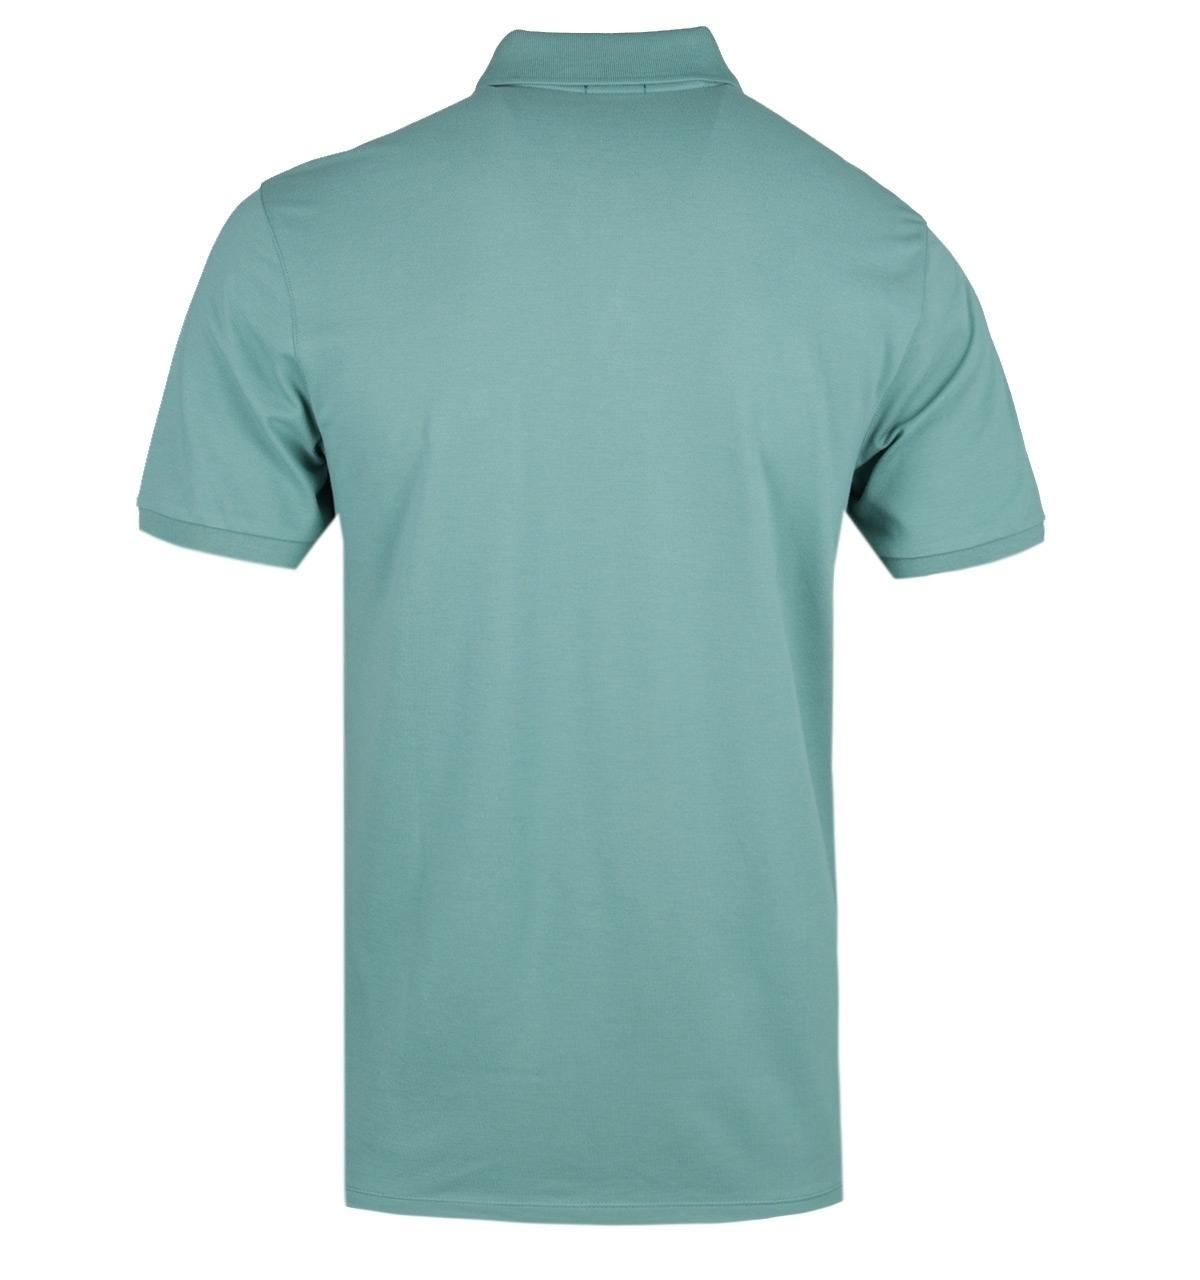 2a0bfb73 BOSS - Pallas Green Polo Shirt for Men - Lyst. View fullscreen